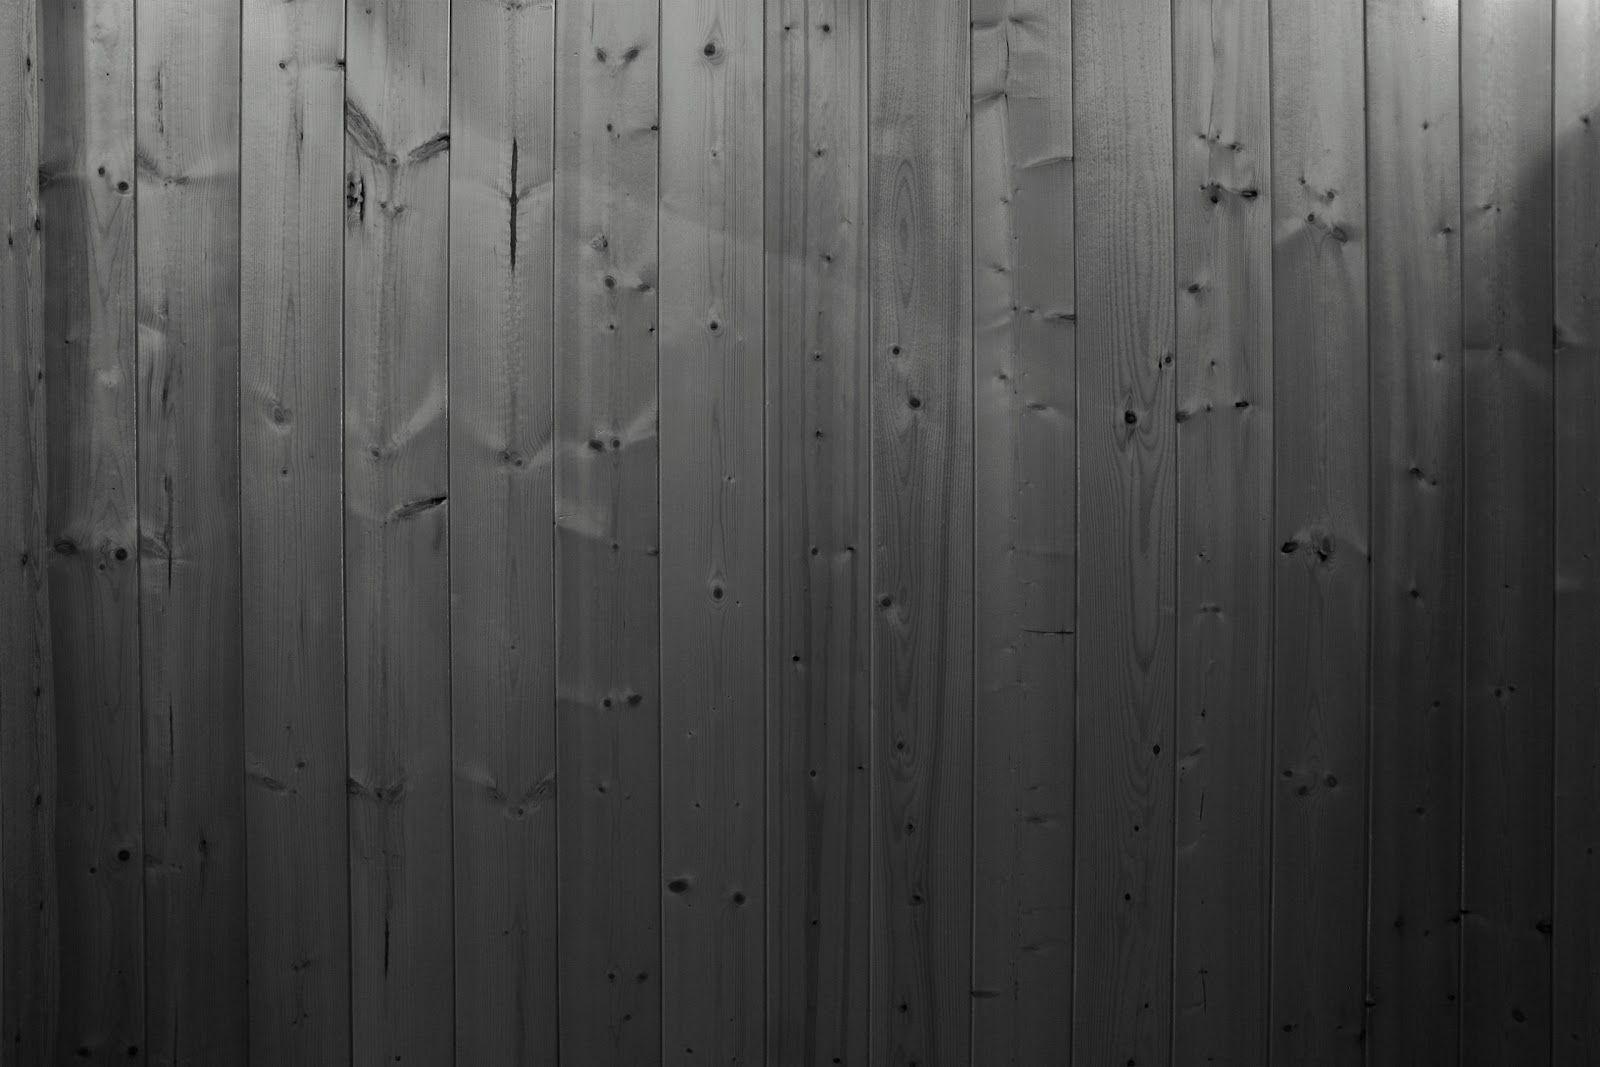 Wood Flooring Google Search Black Wood Floors Black Laminate Flooring Dark Wood Texture